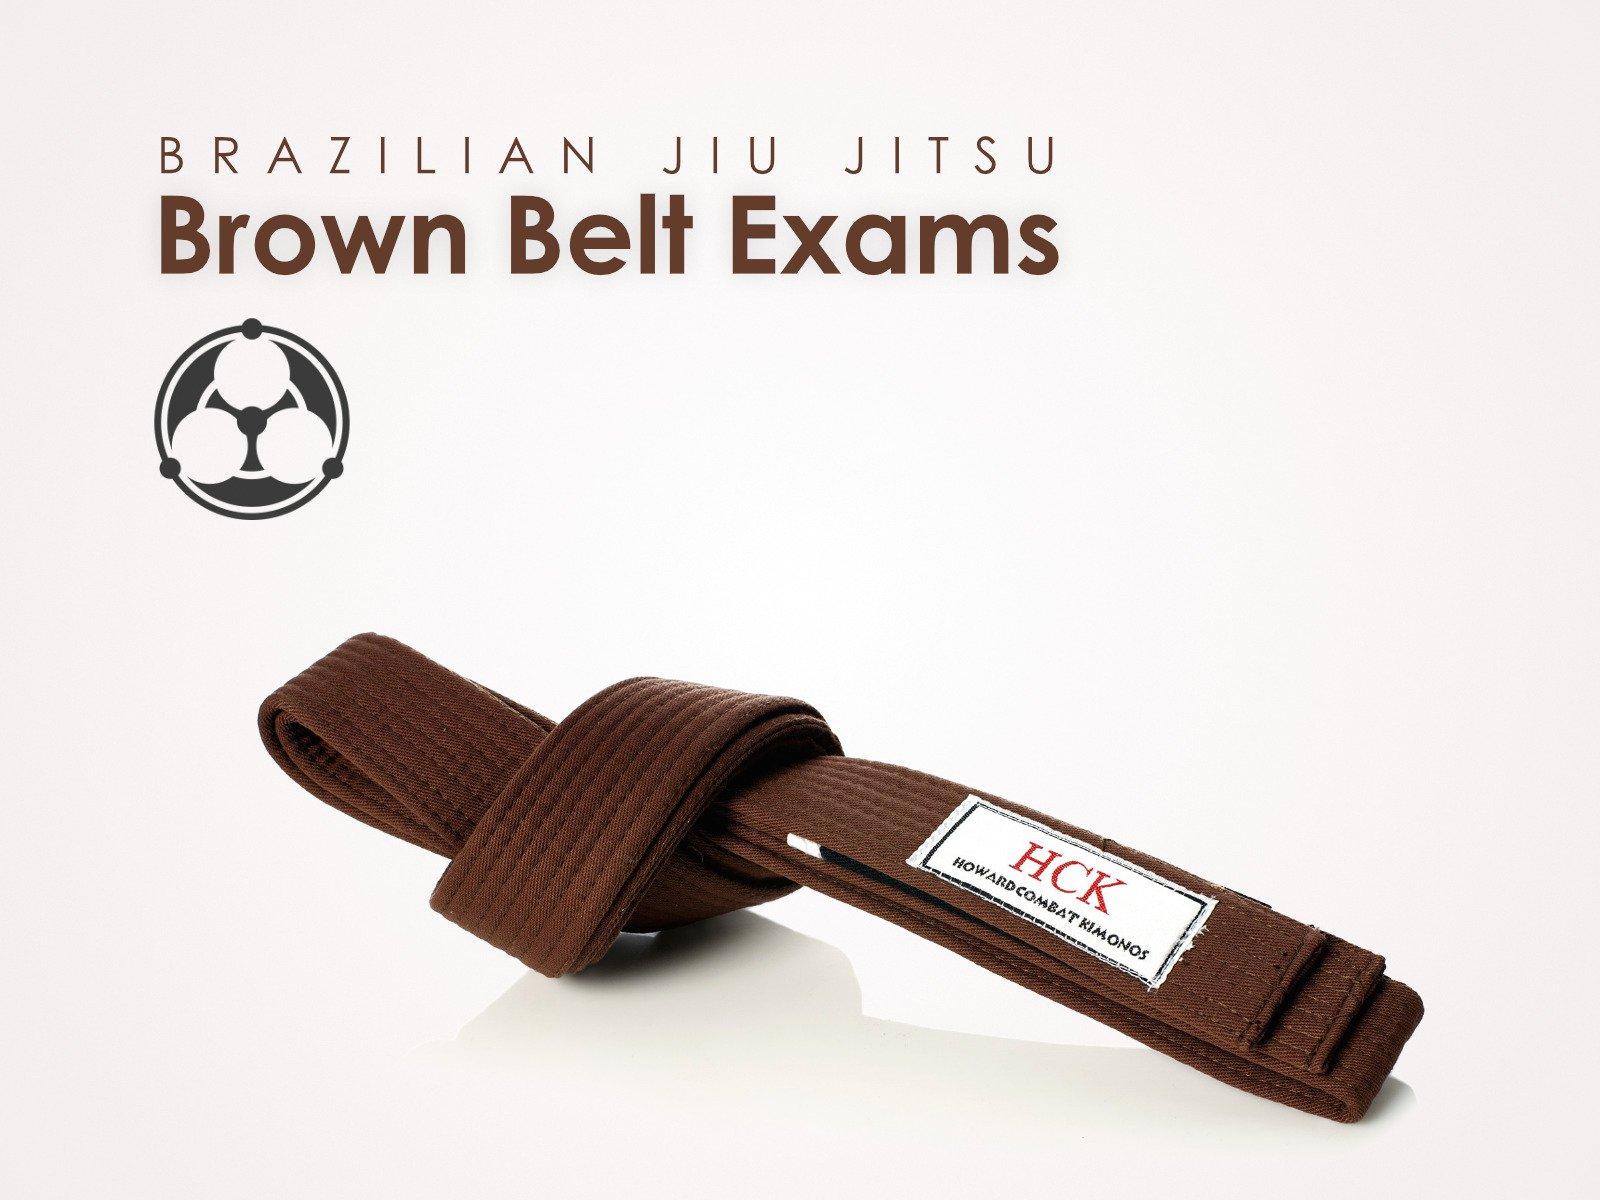 Brazilian Jiu Jitsu: Brown Belt Exams - Season 1